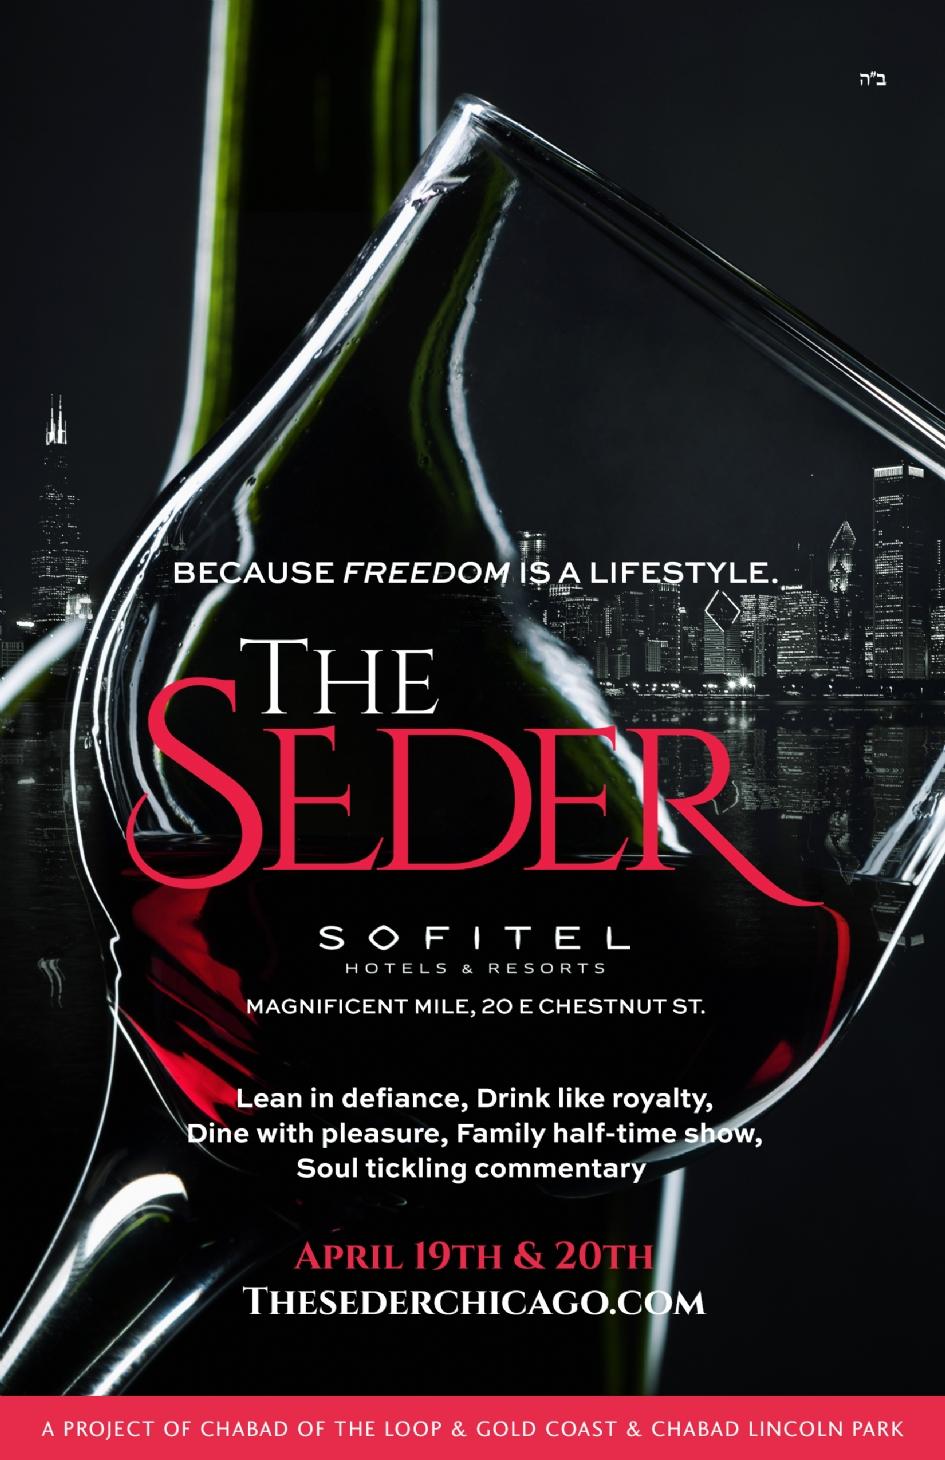 Seder for you (1).jpg